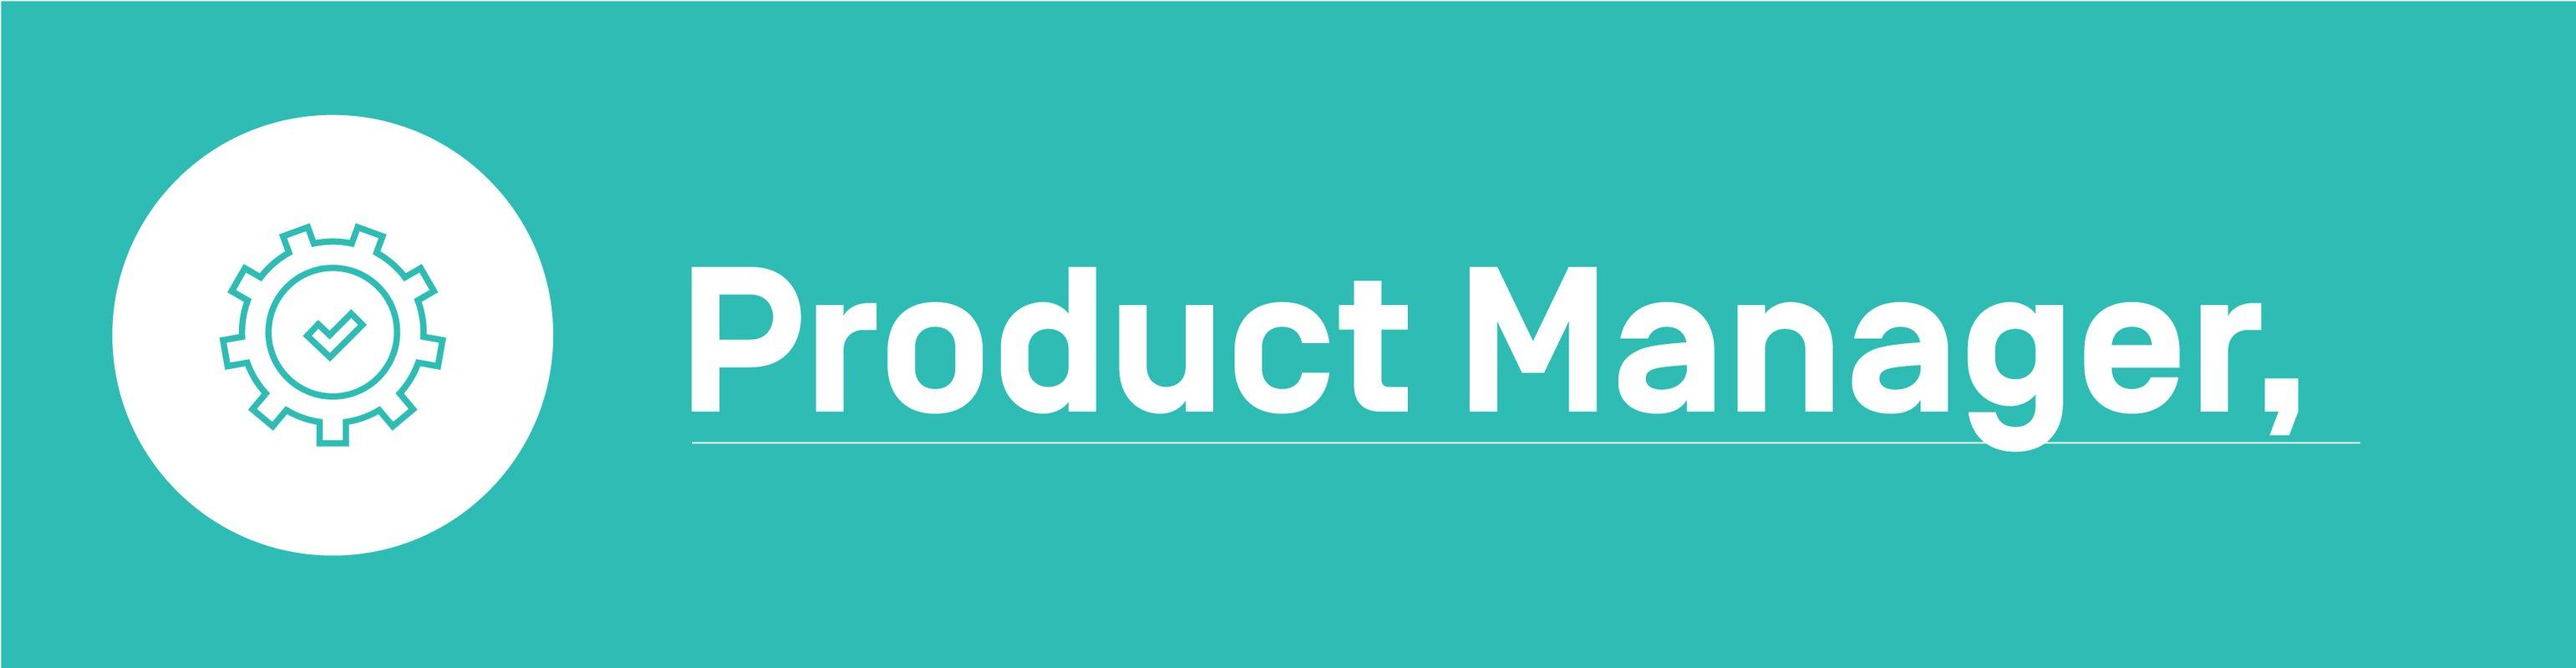 Algorithmic bias - Product Manager